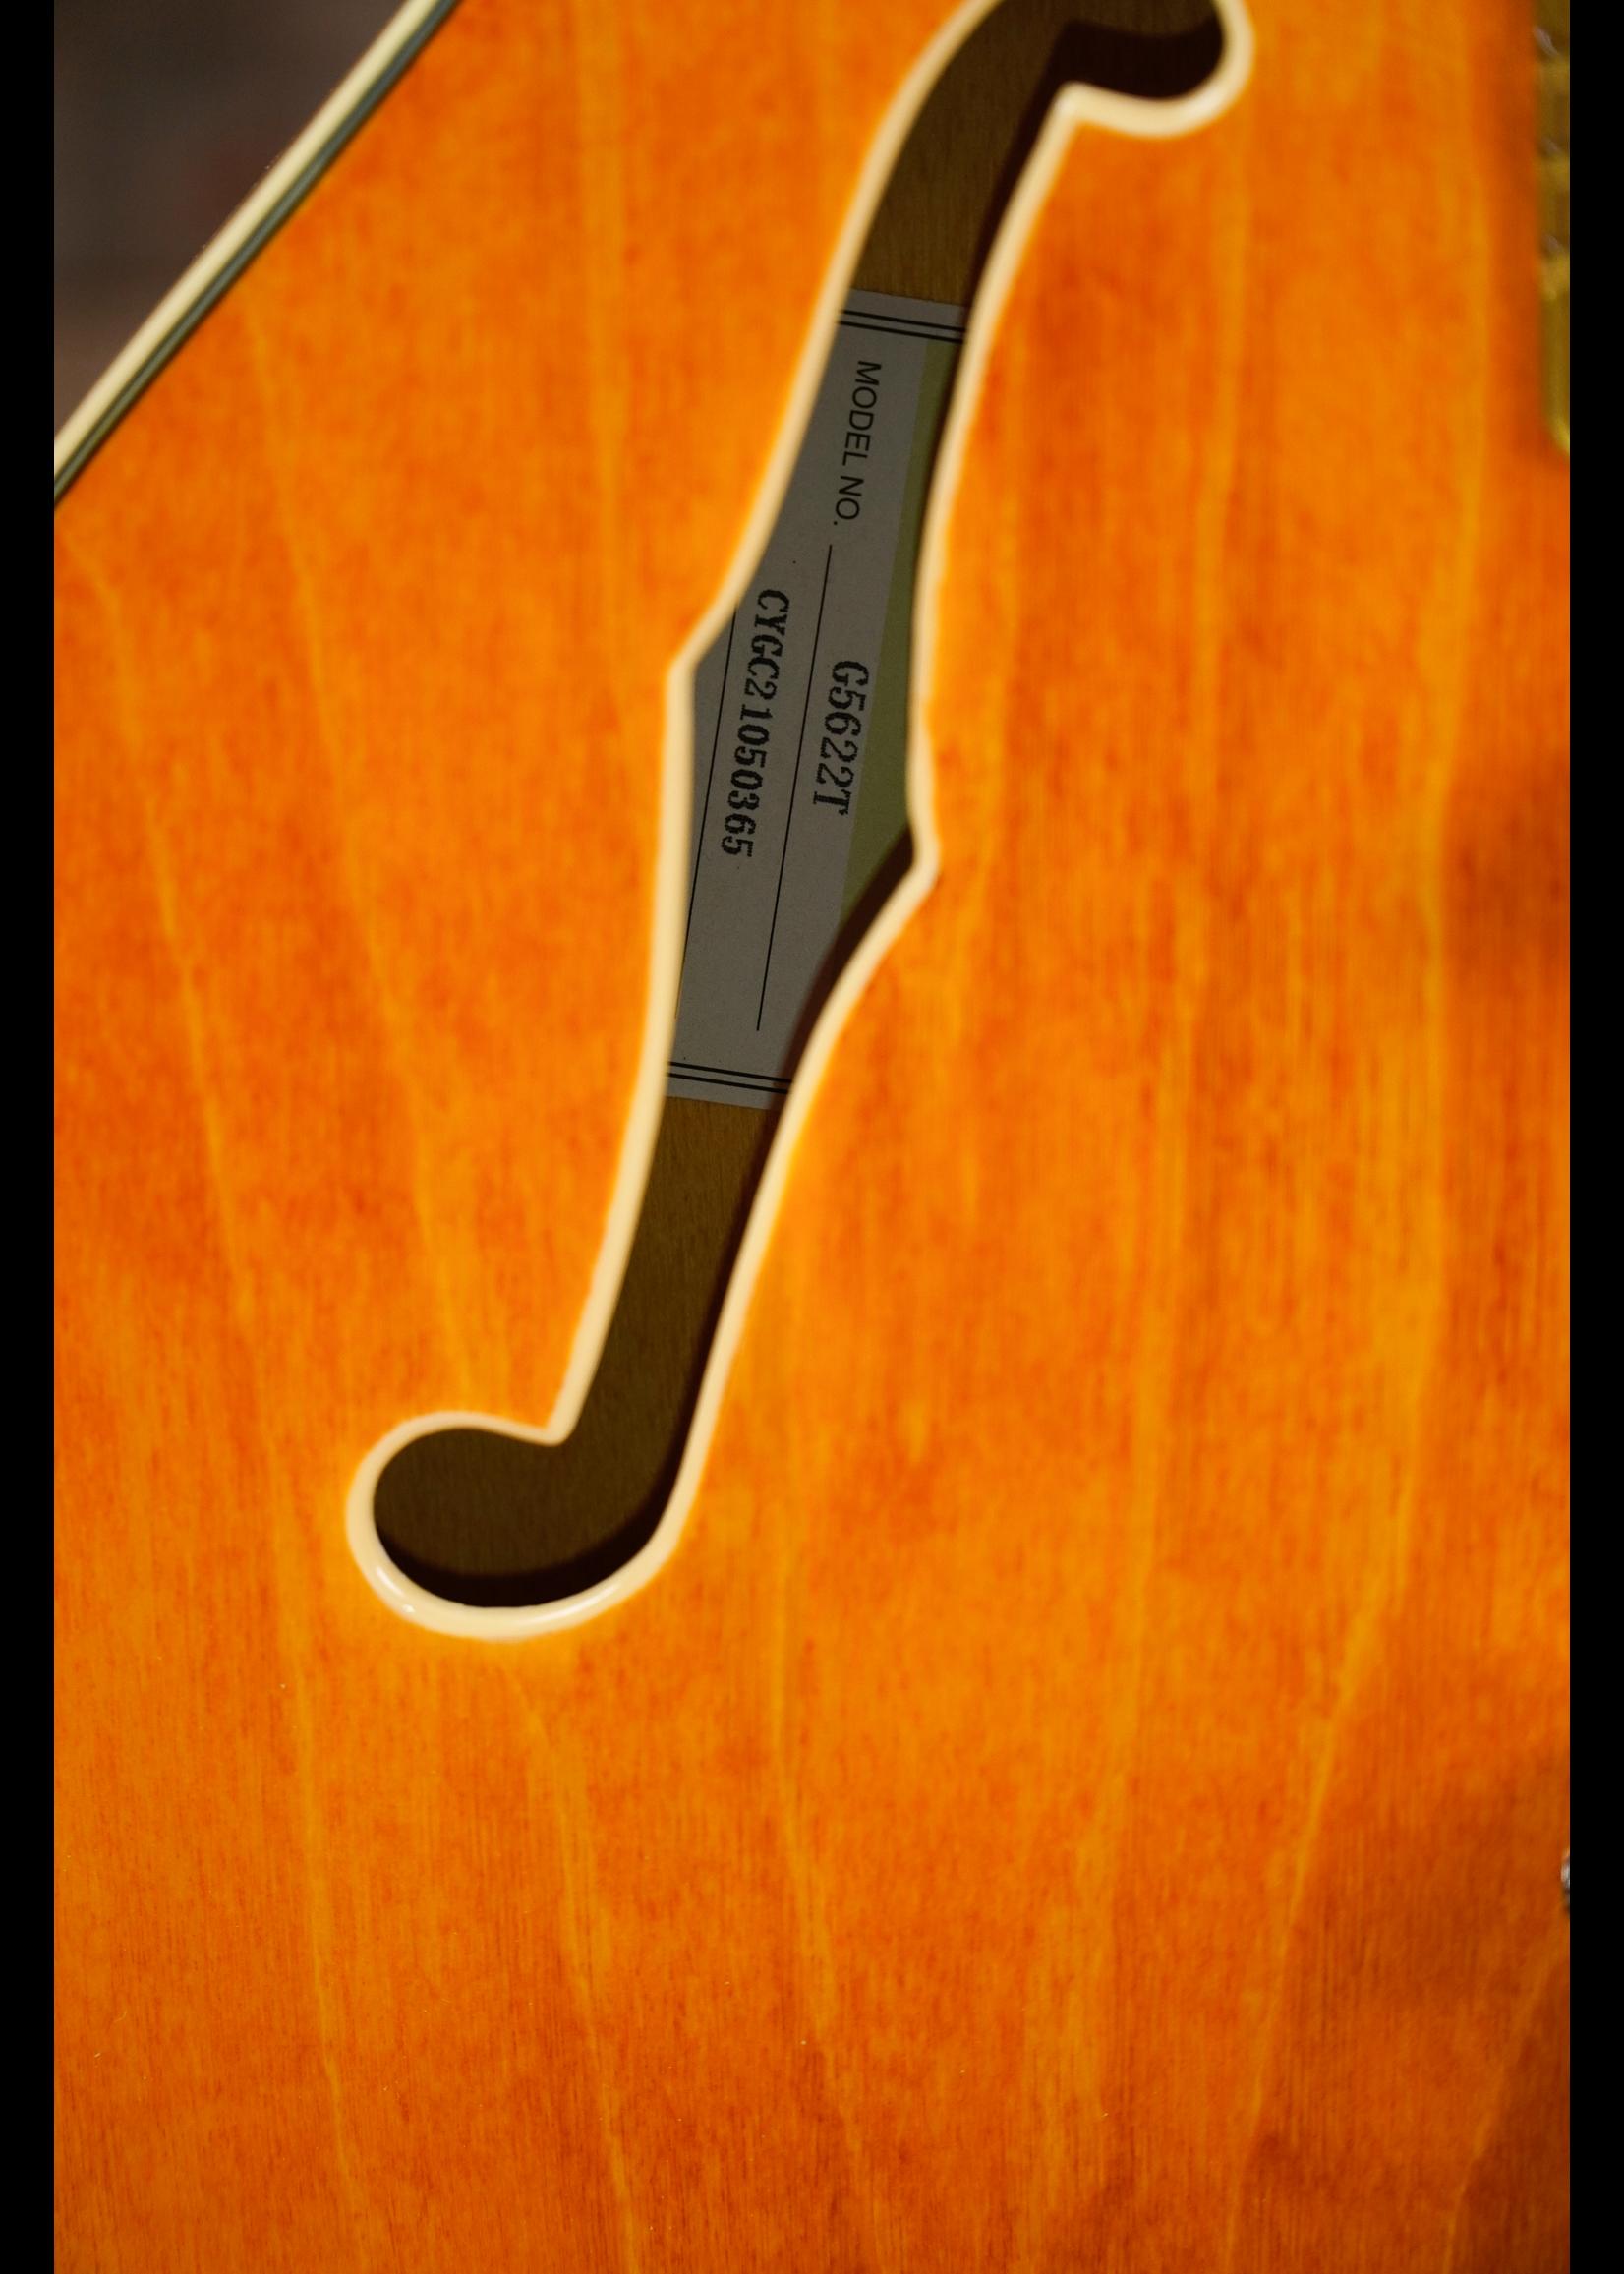 Gretsch Gretsch G5622T Electromatic® Center Block Double-Cut with Bigsby®, Laurel Fingerboard, Speyside